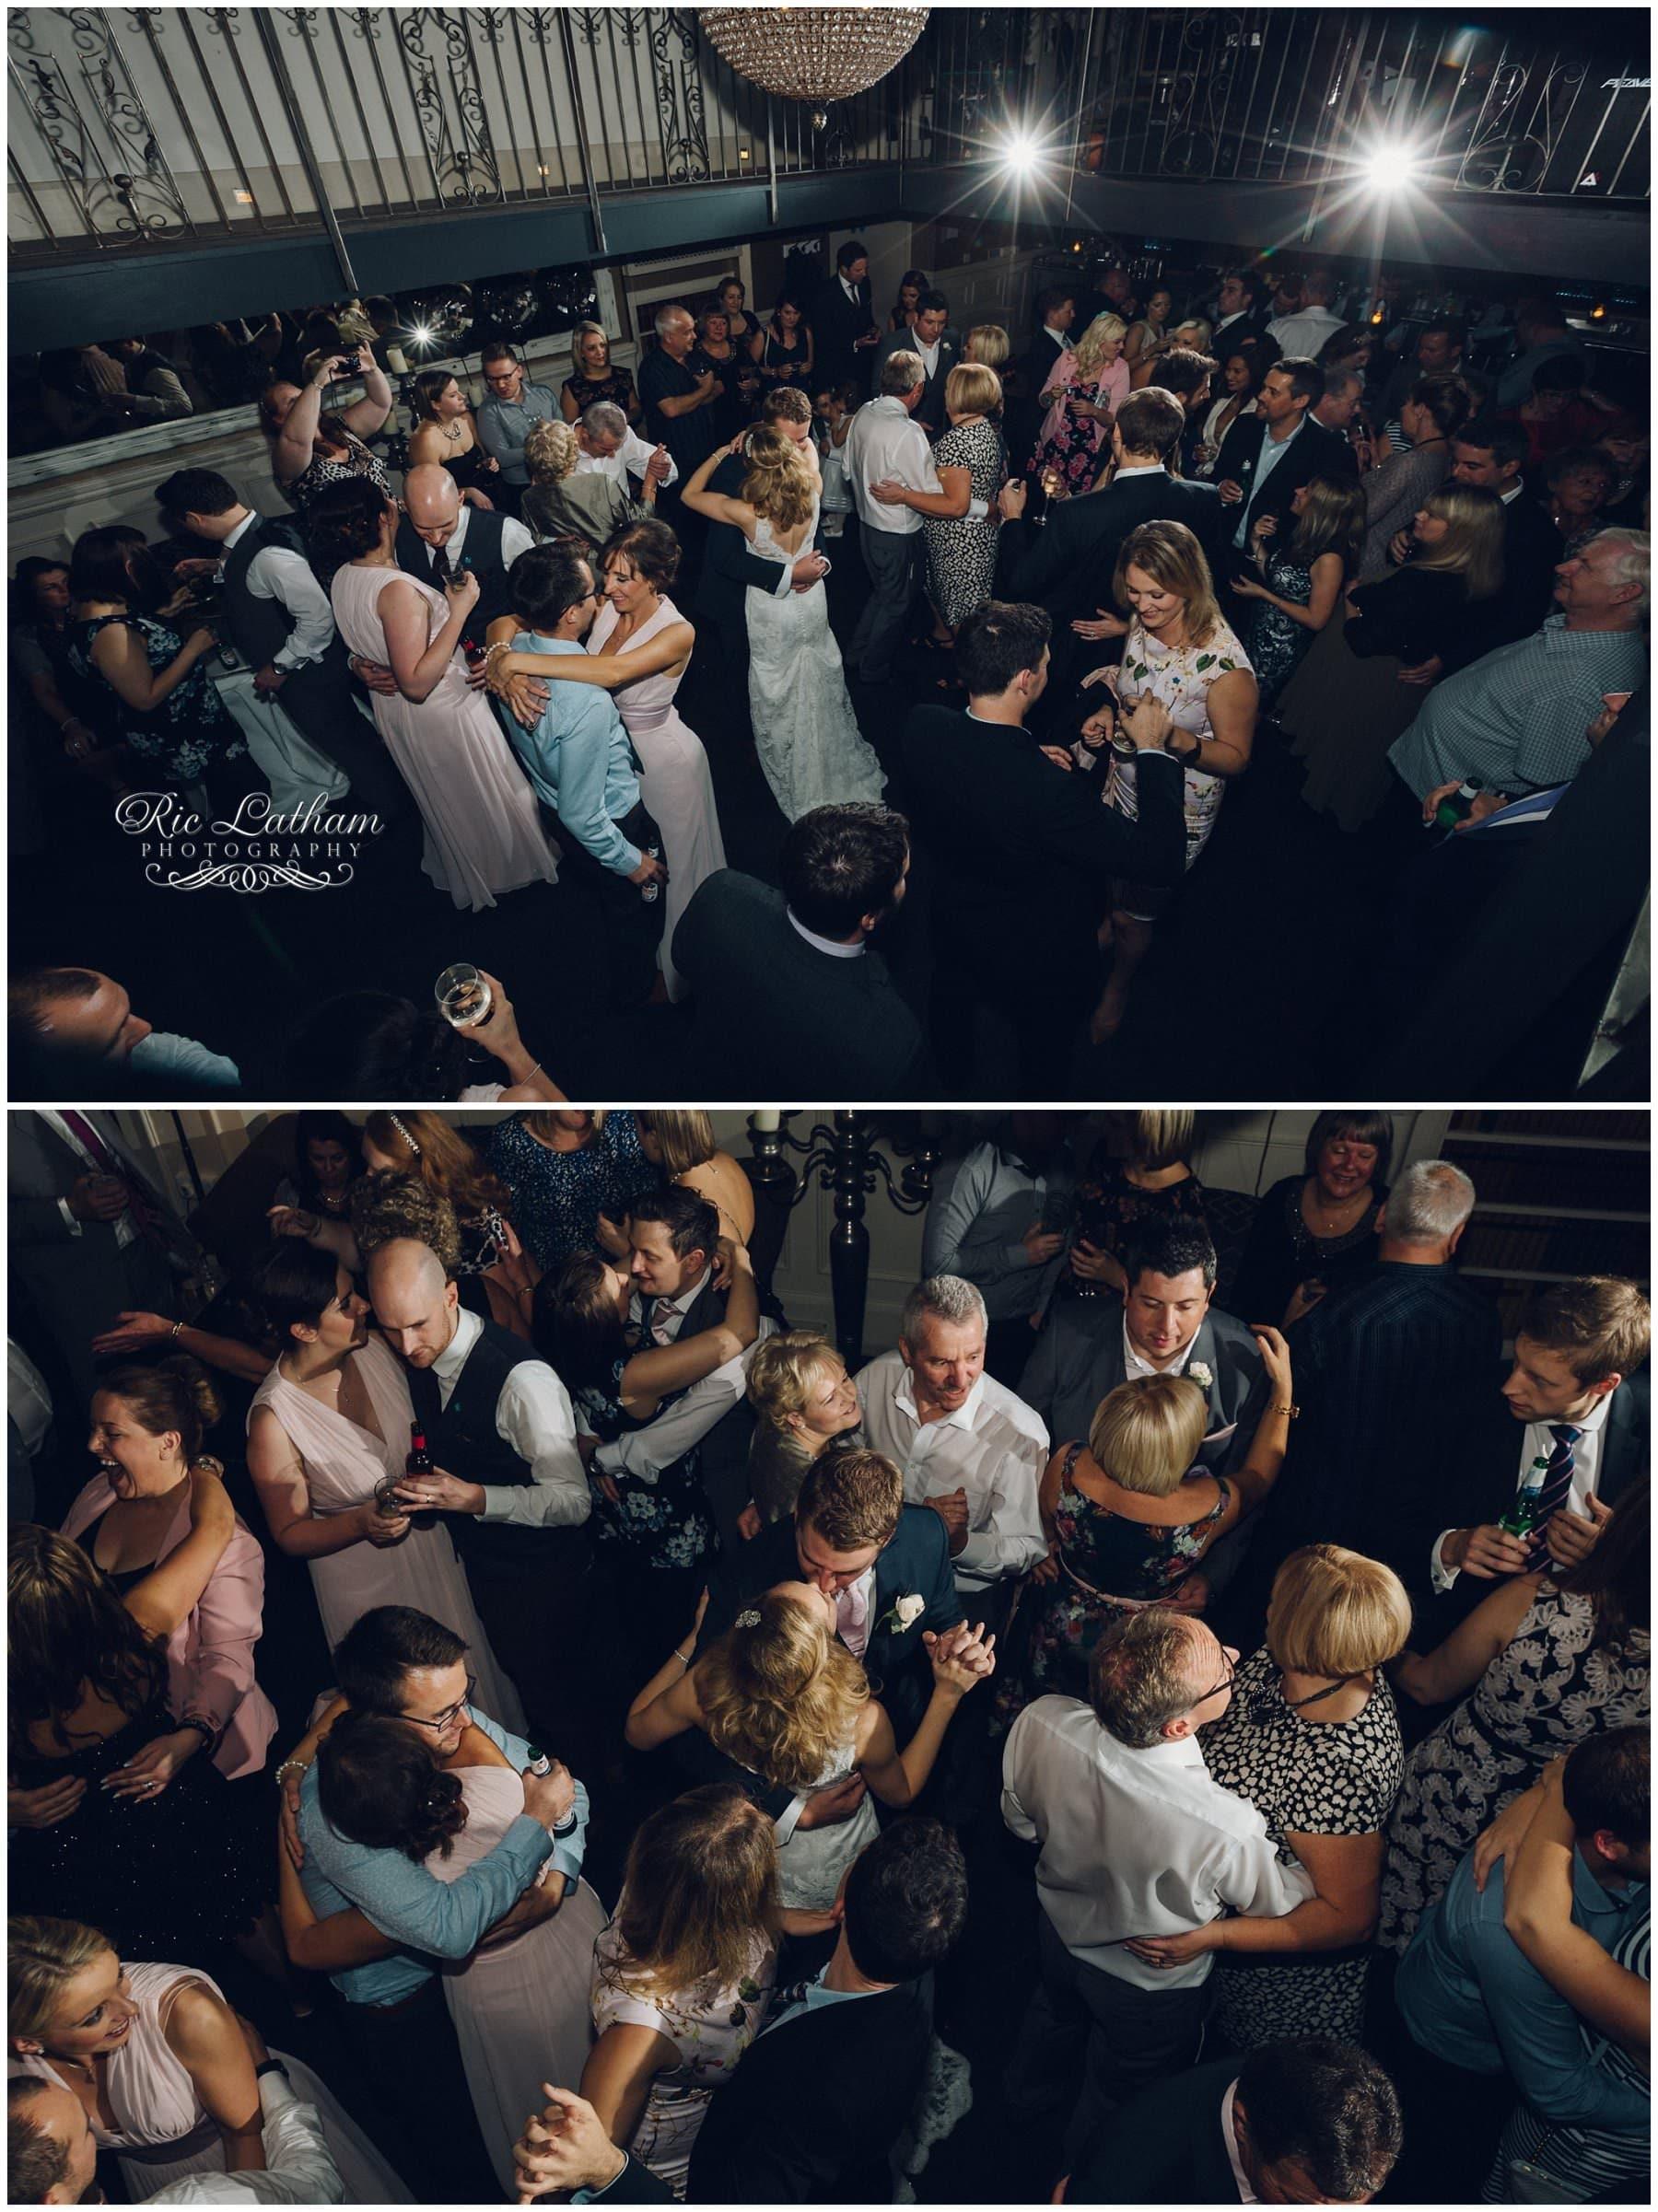 wedding guests dancing at Great John Street Hotel